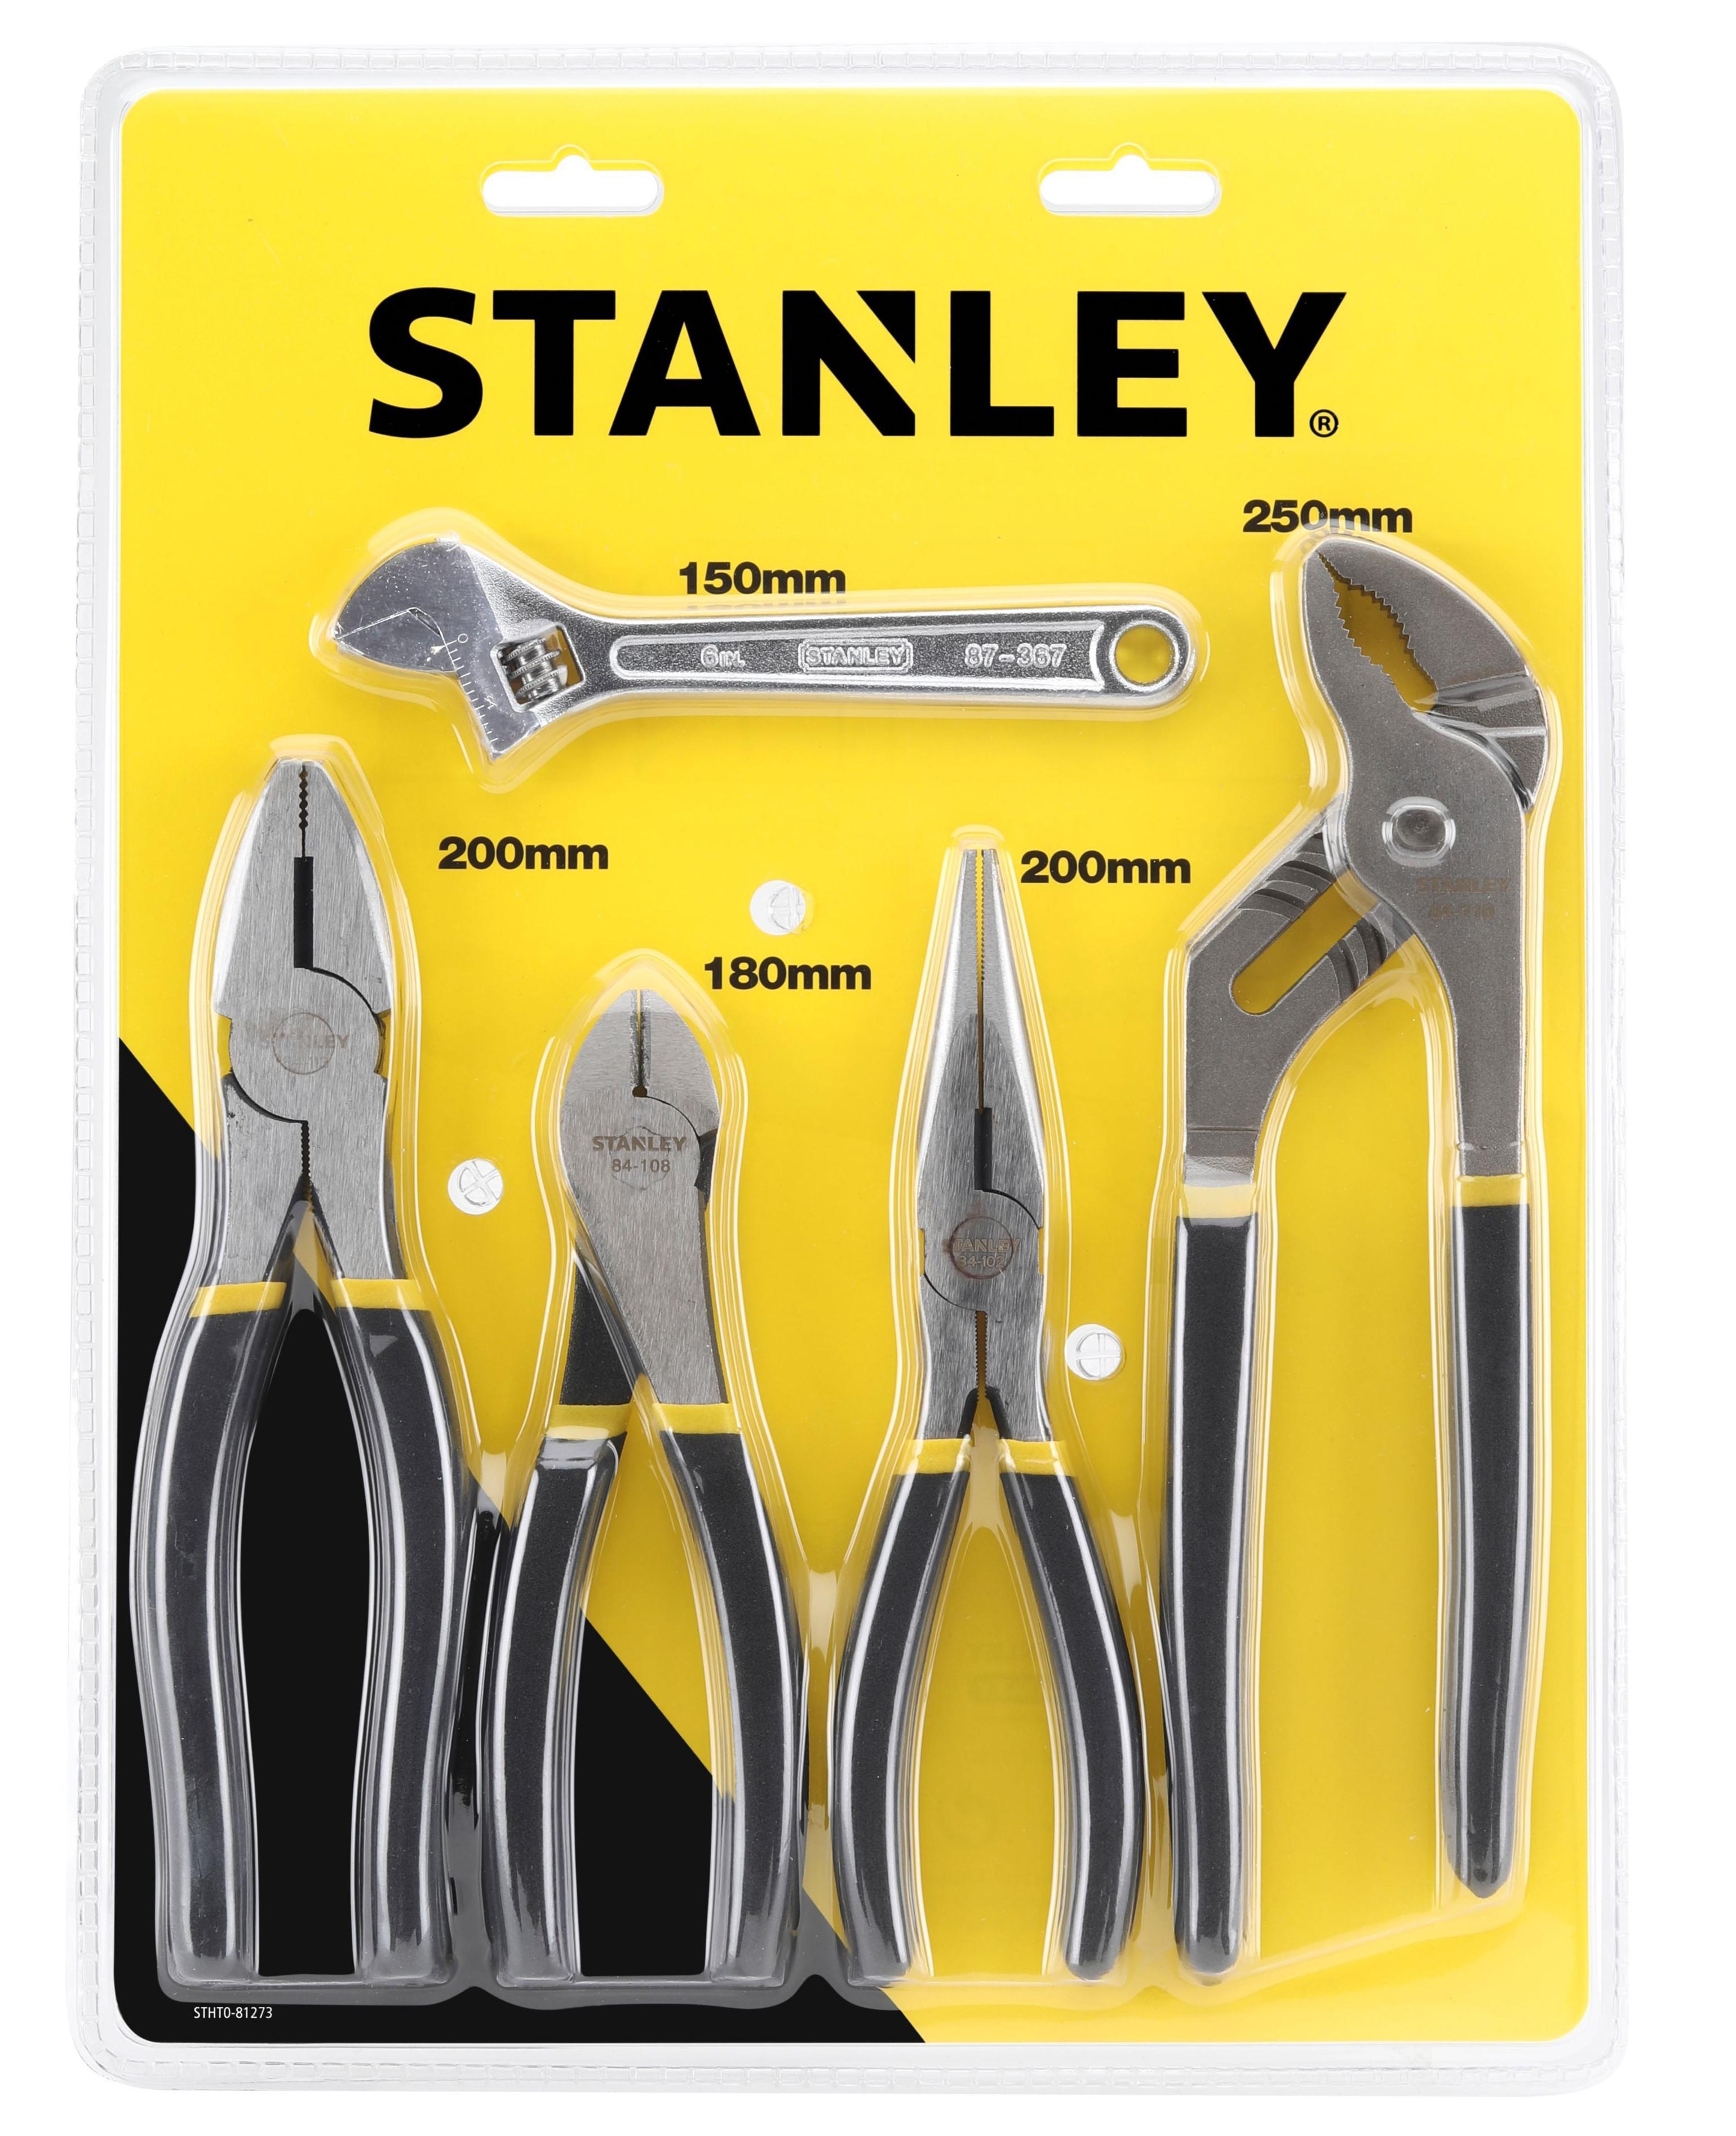 Stanley 4 Piece Steel Pliers Set for £10 @ B&Q (Free C&C)